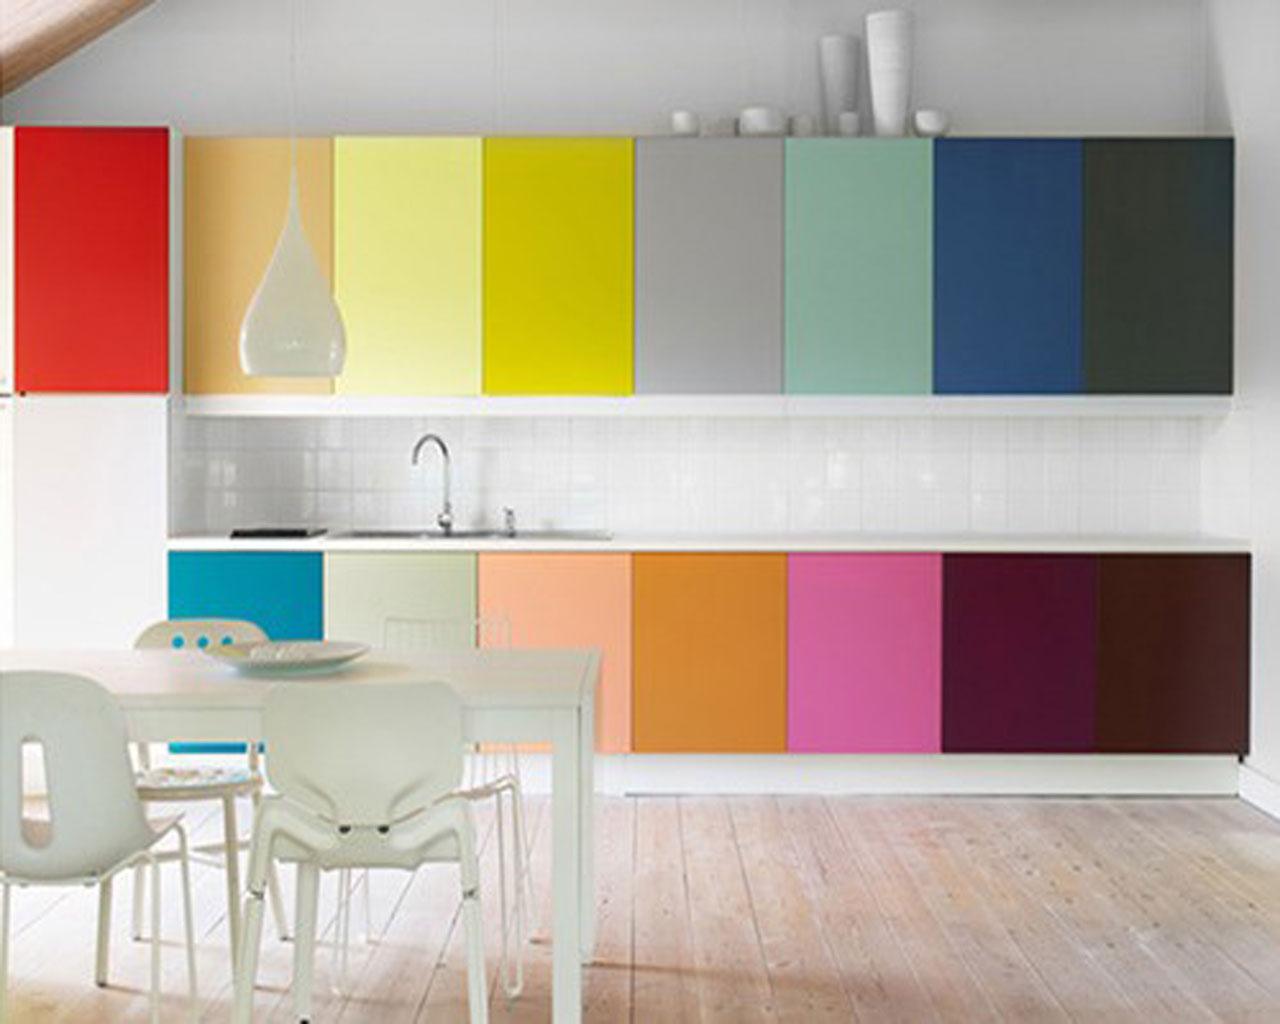 Desain Dapur Minimalis Unik Full Color 01